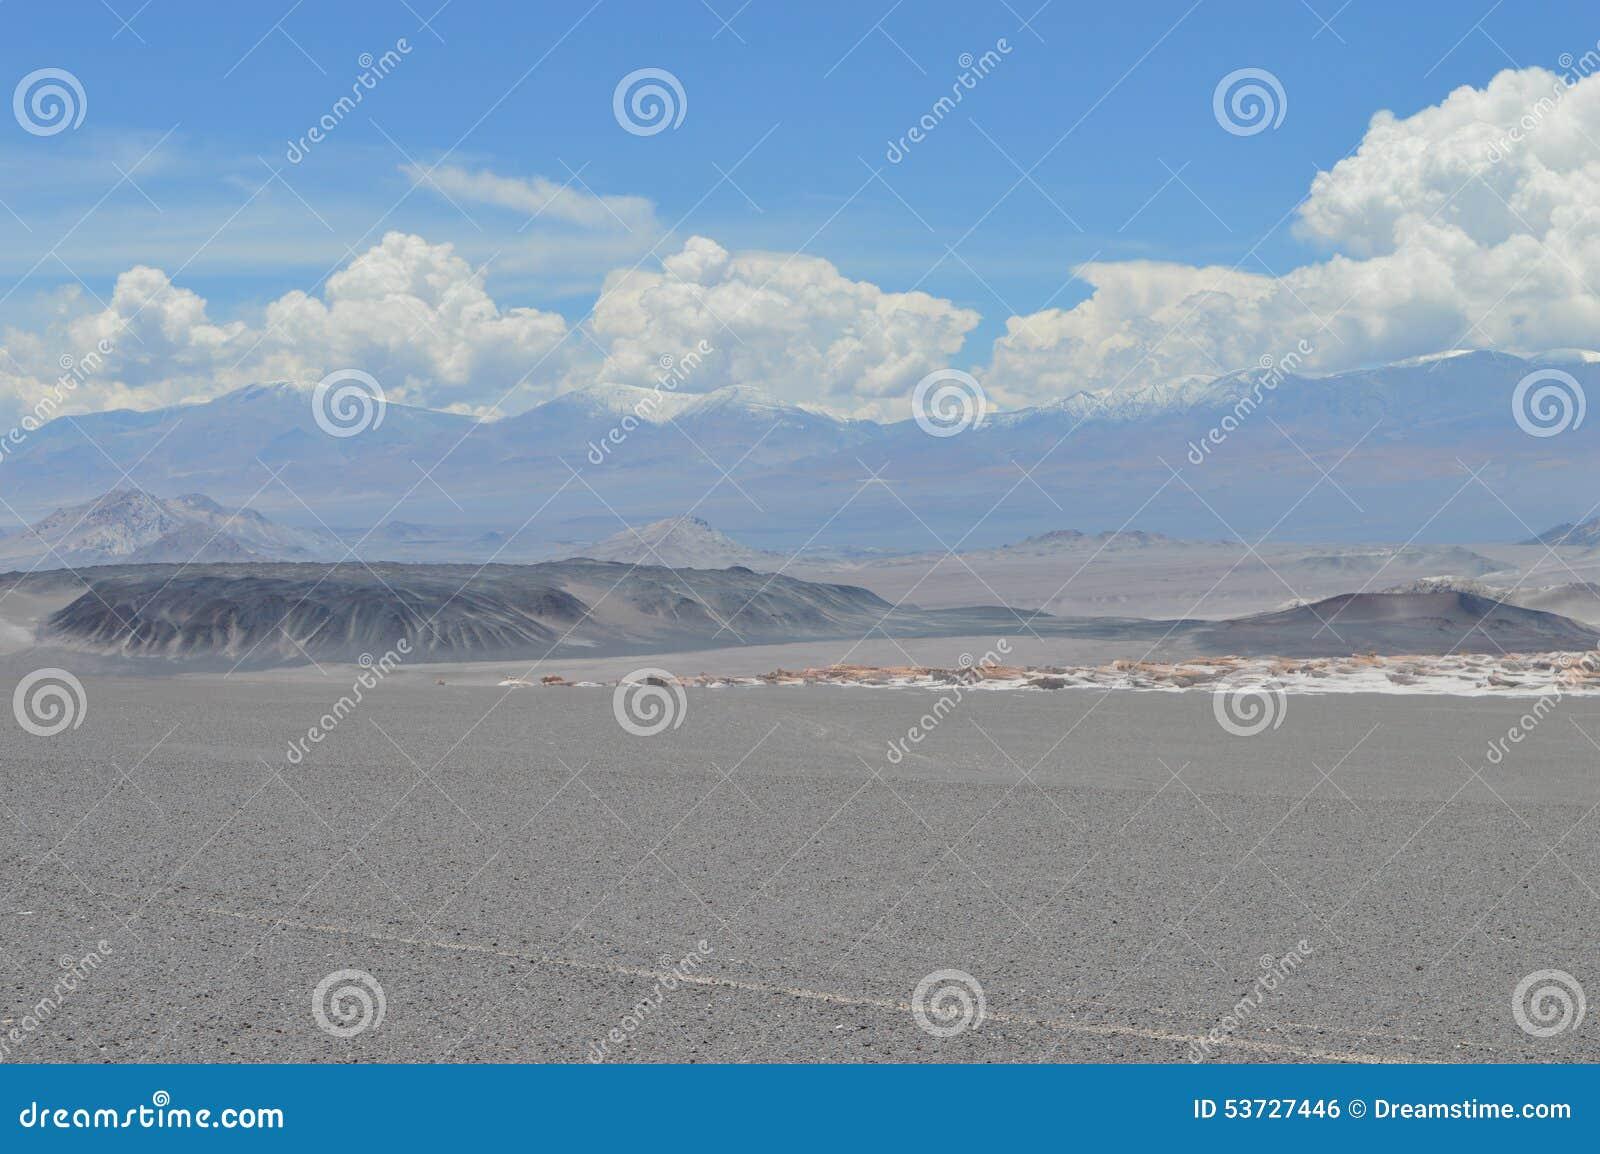 Antofagasta de la Serra